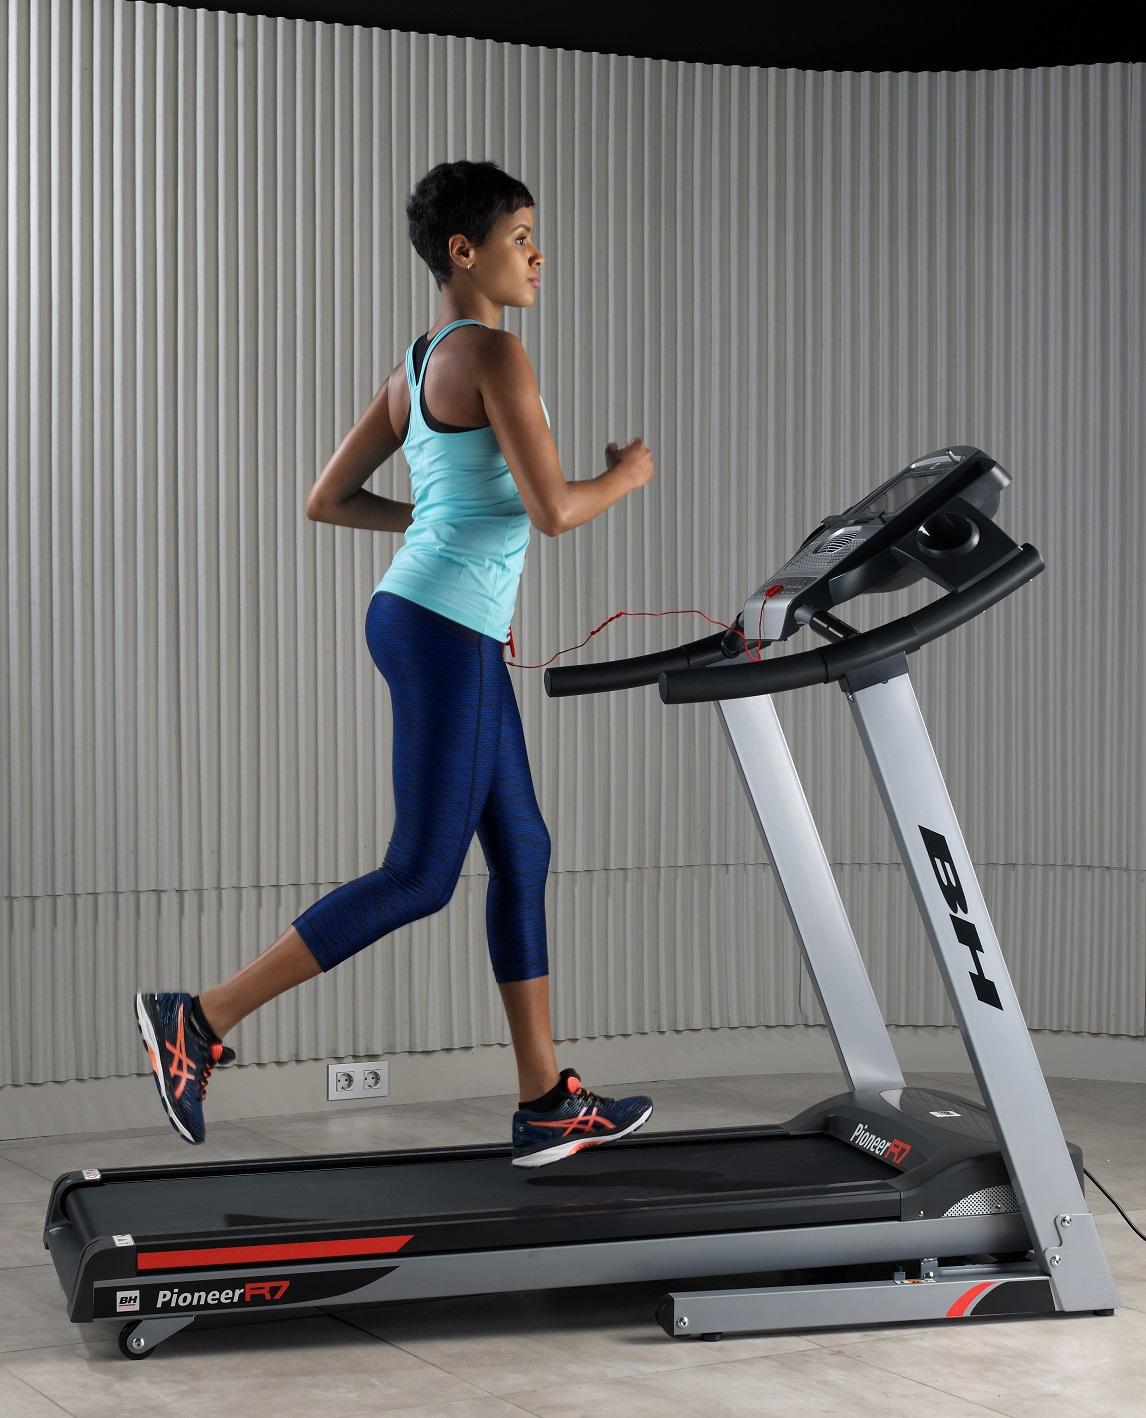 BH Fitness PIONEER R7 TFT